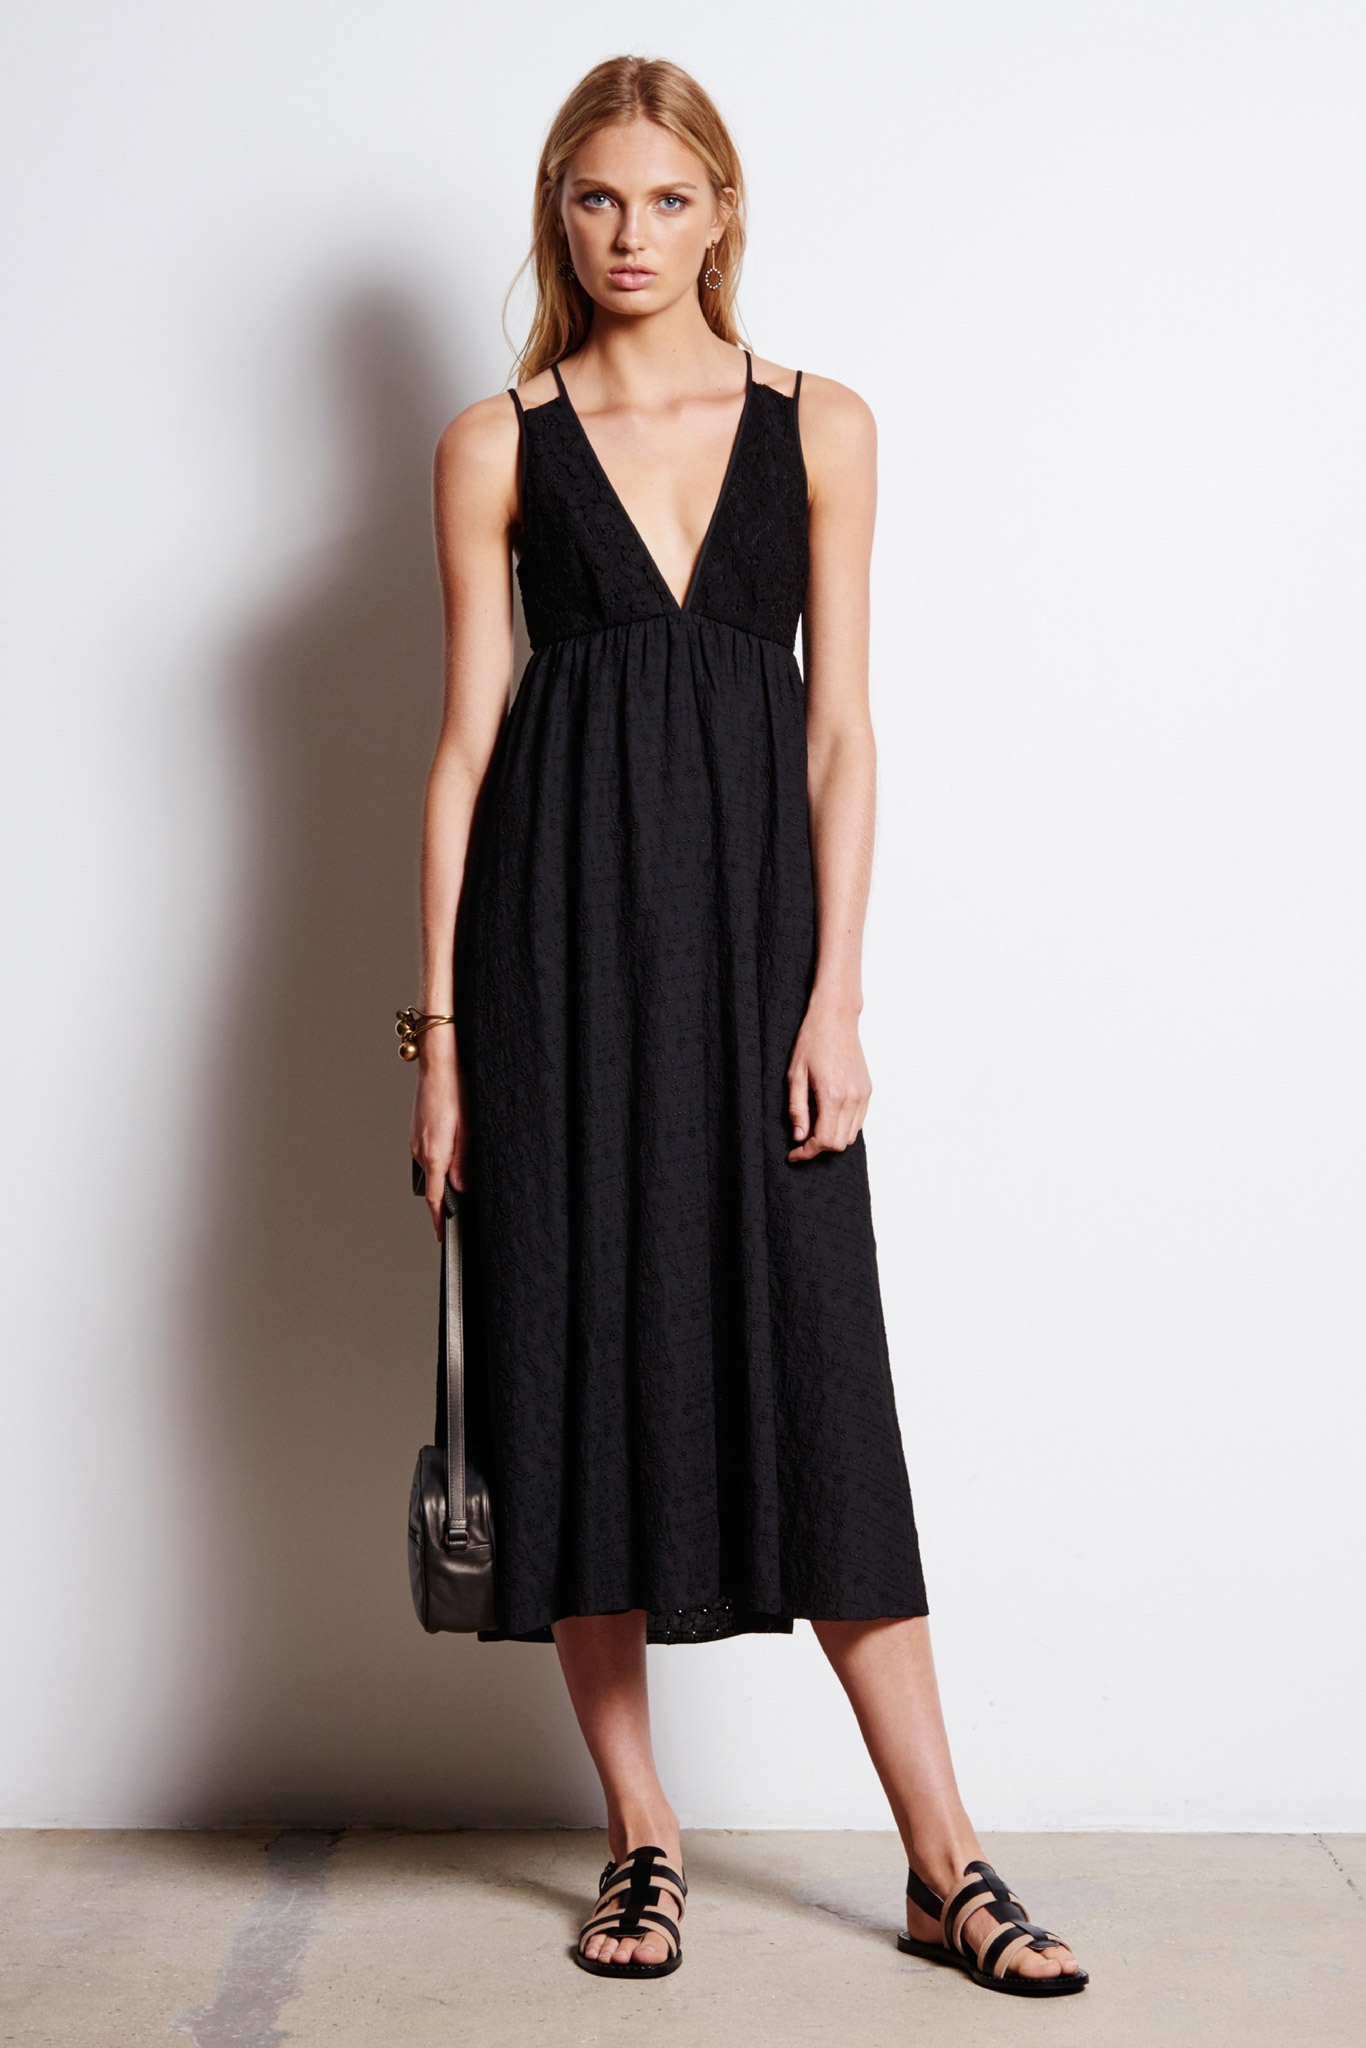 The Tomas Maier Little Black Dress